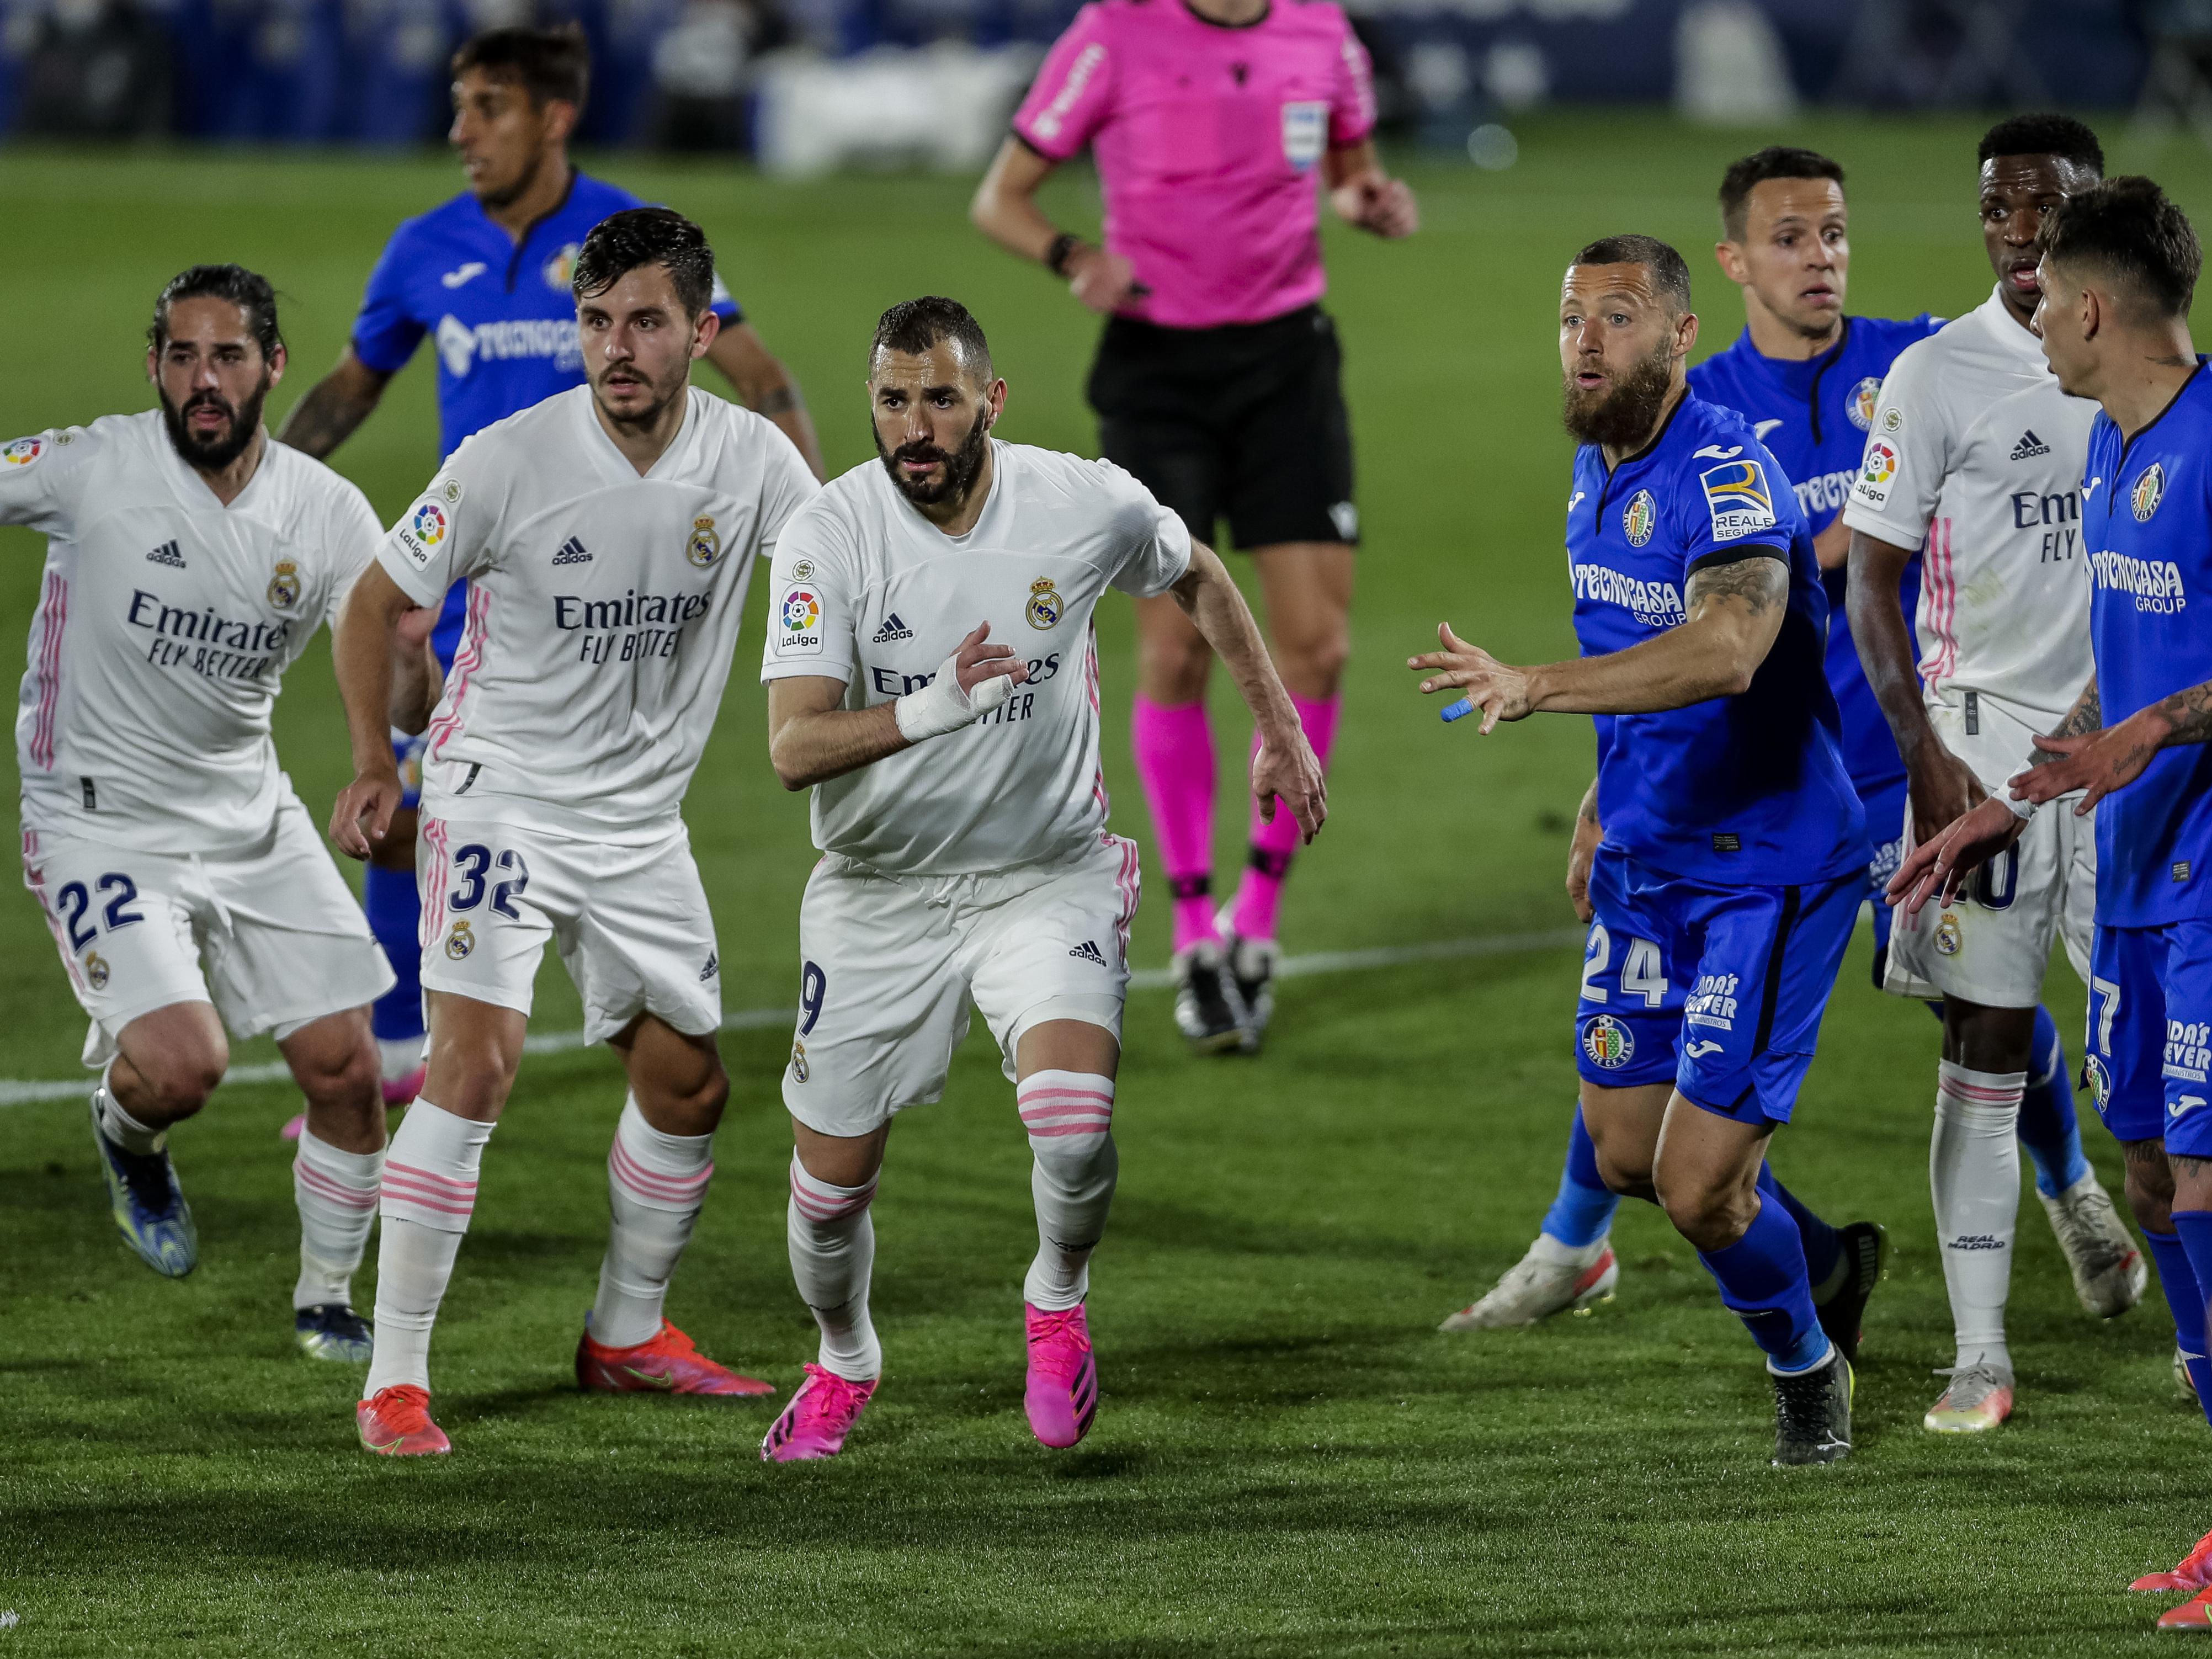 12 Of Europe's Top Soccer Teams Create New 'Super League' : NPR